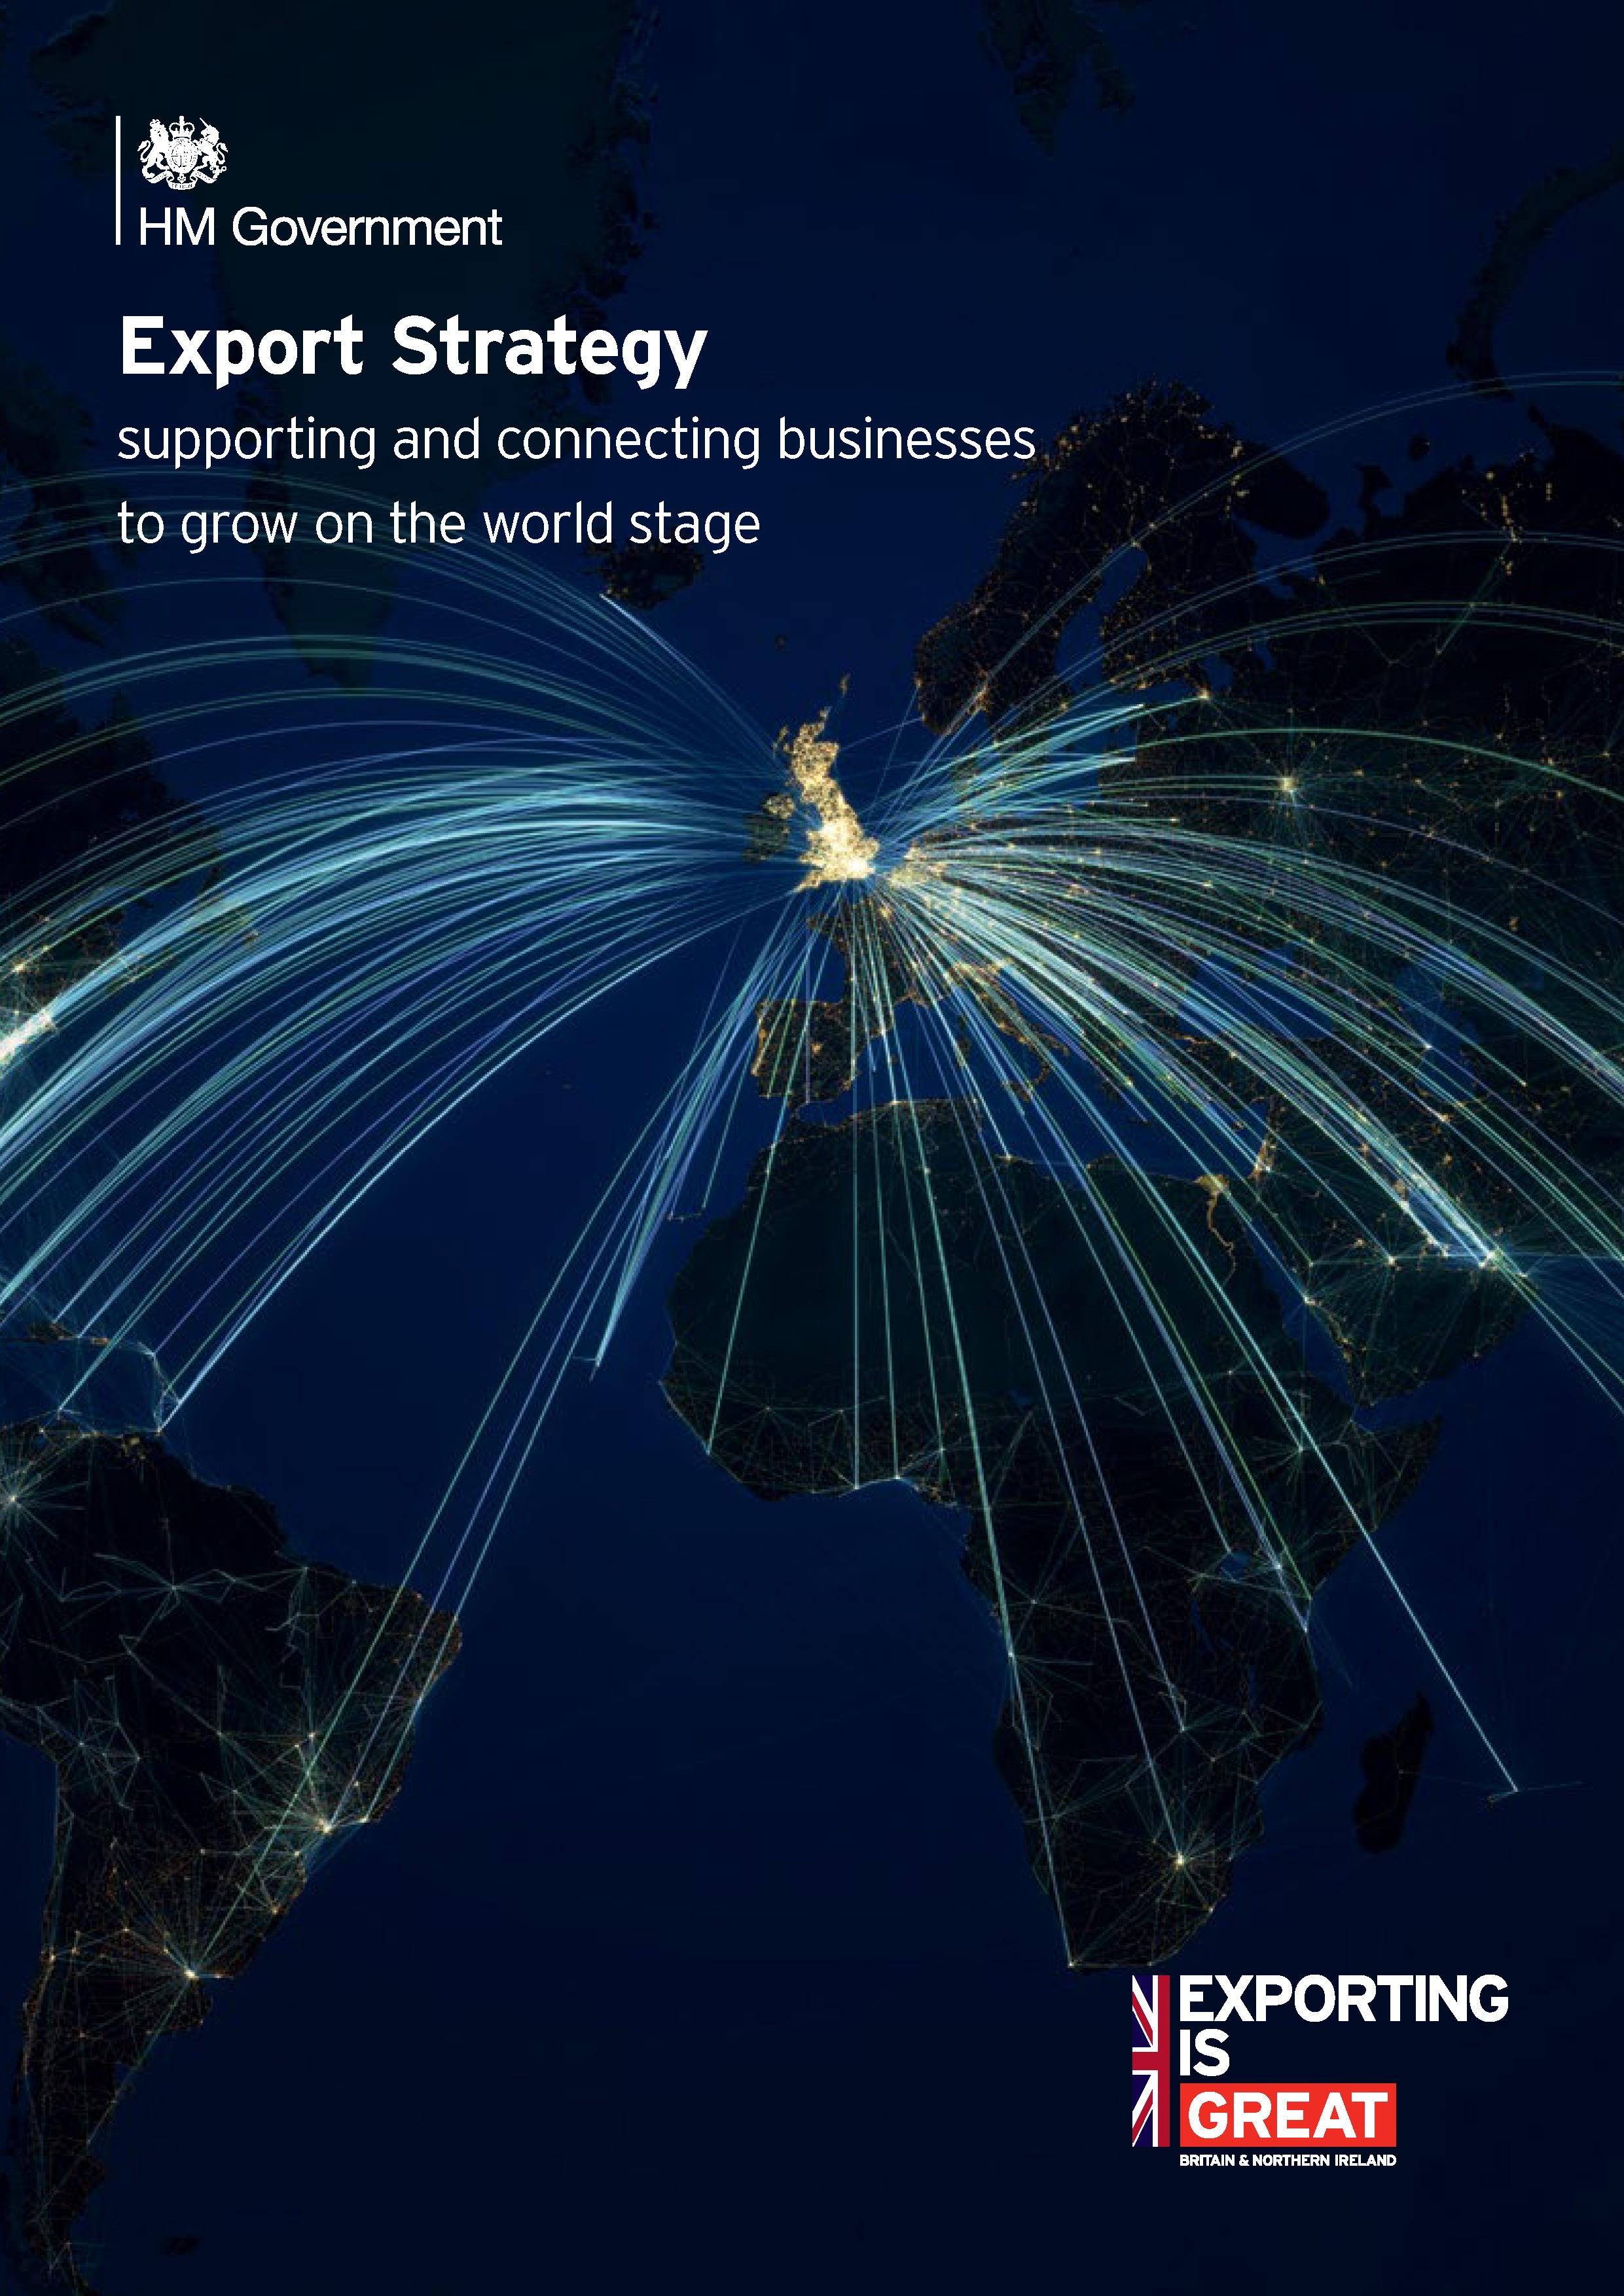 HMG Export Strategy 2018